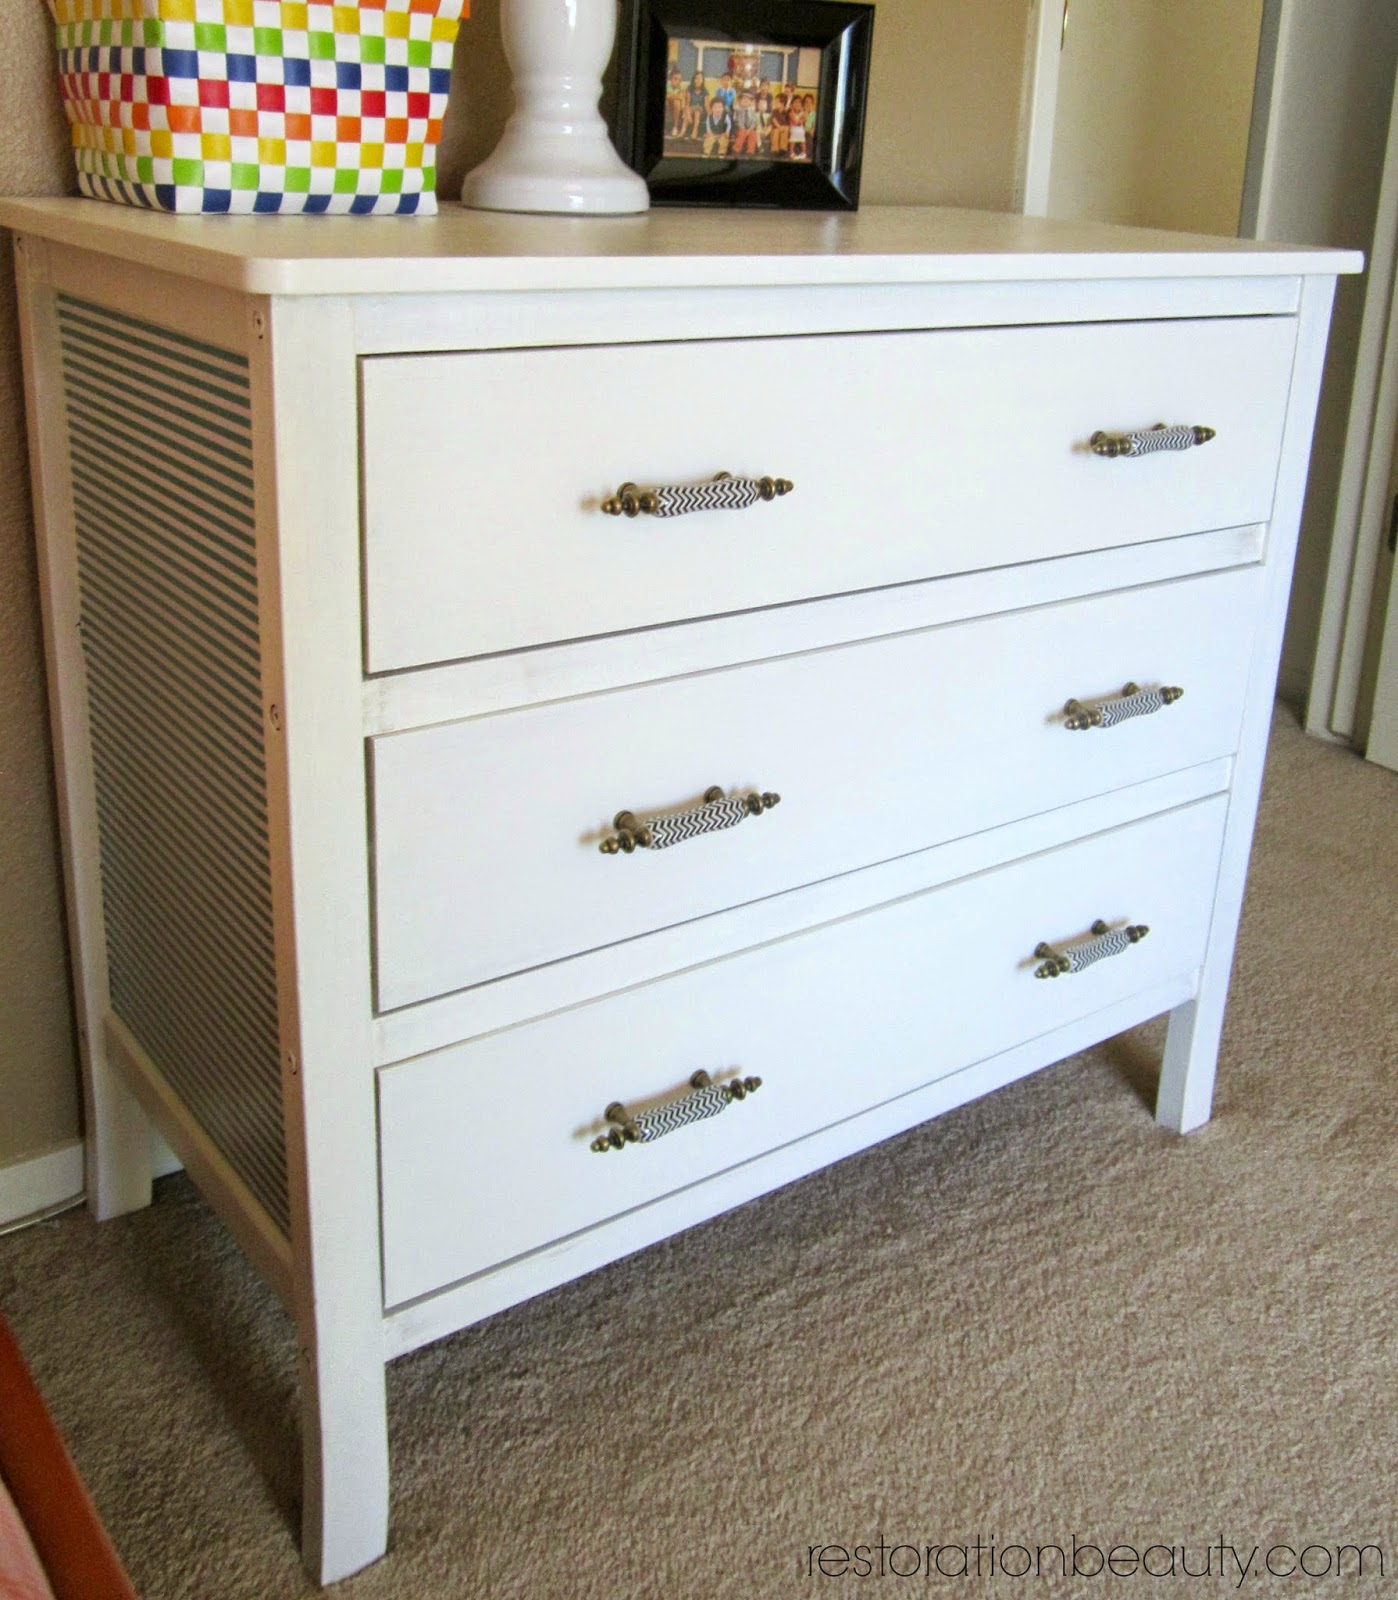 Restoration Beauty: Dresser Makeover Using DIY Chalk Paint